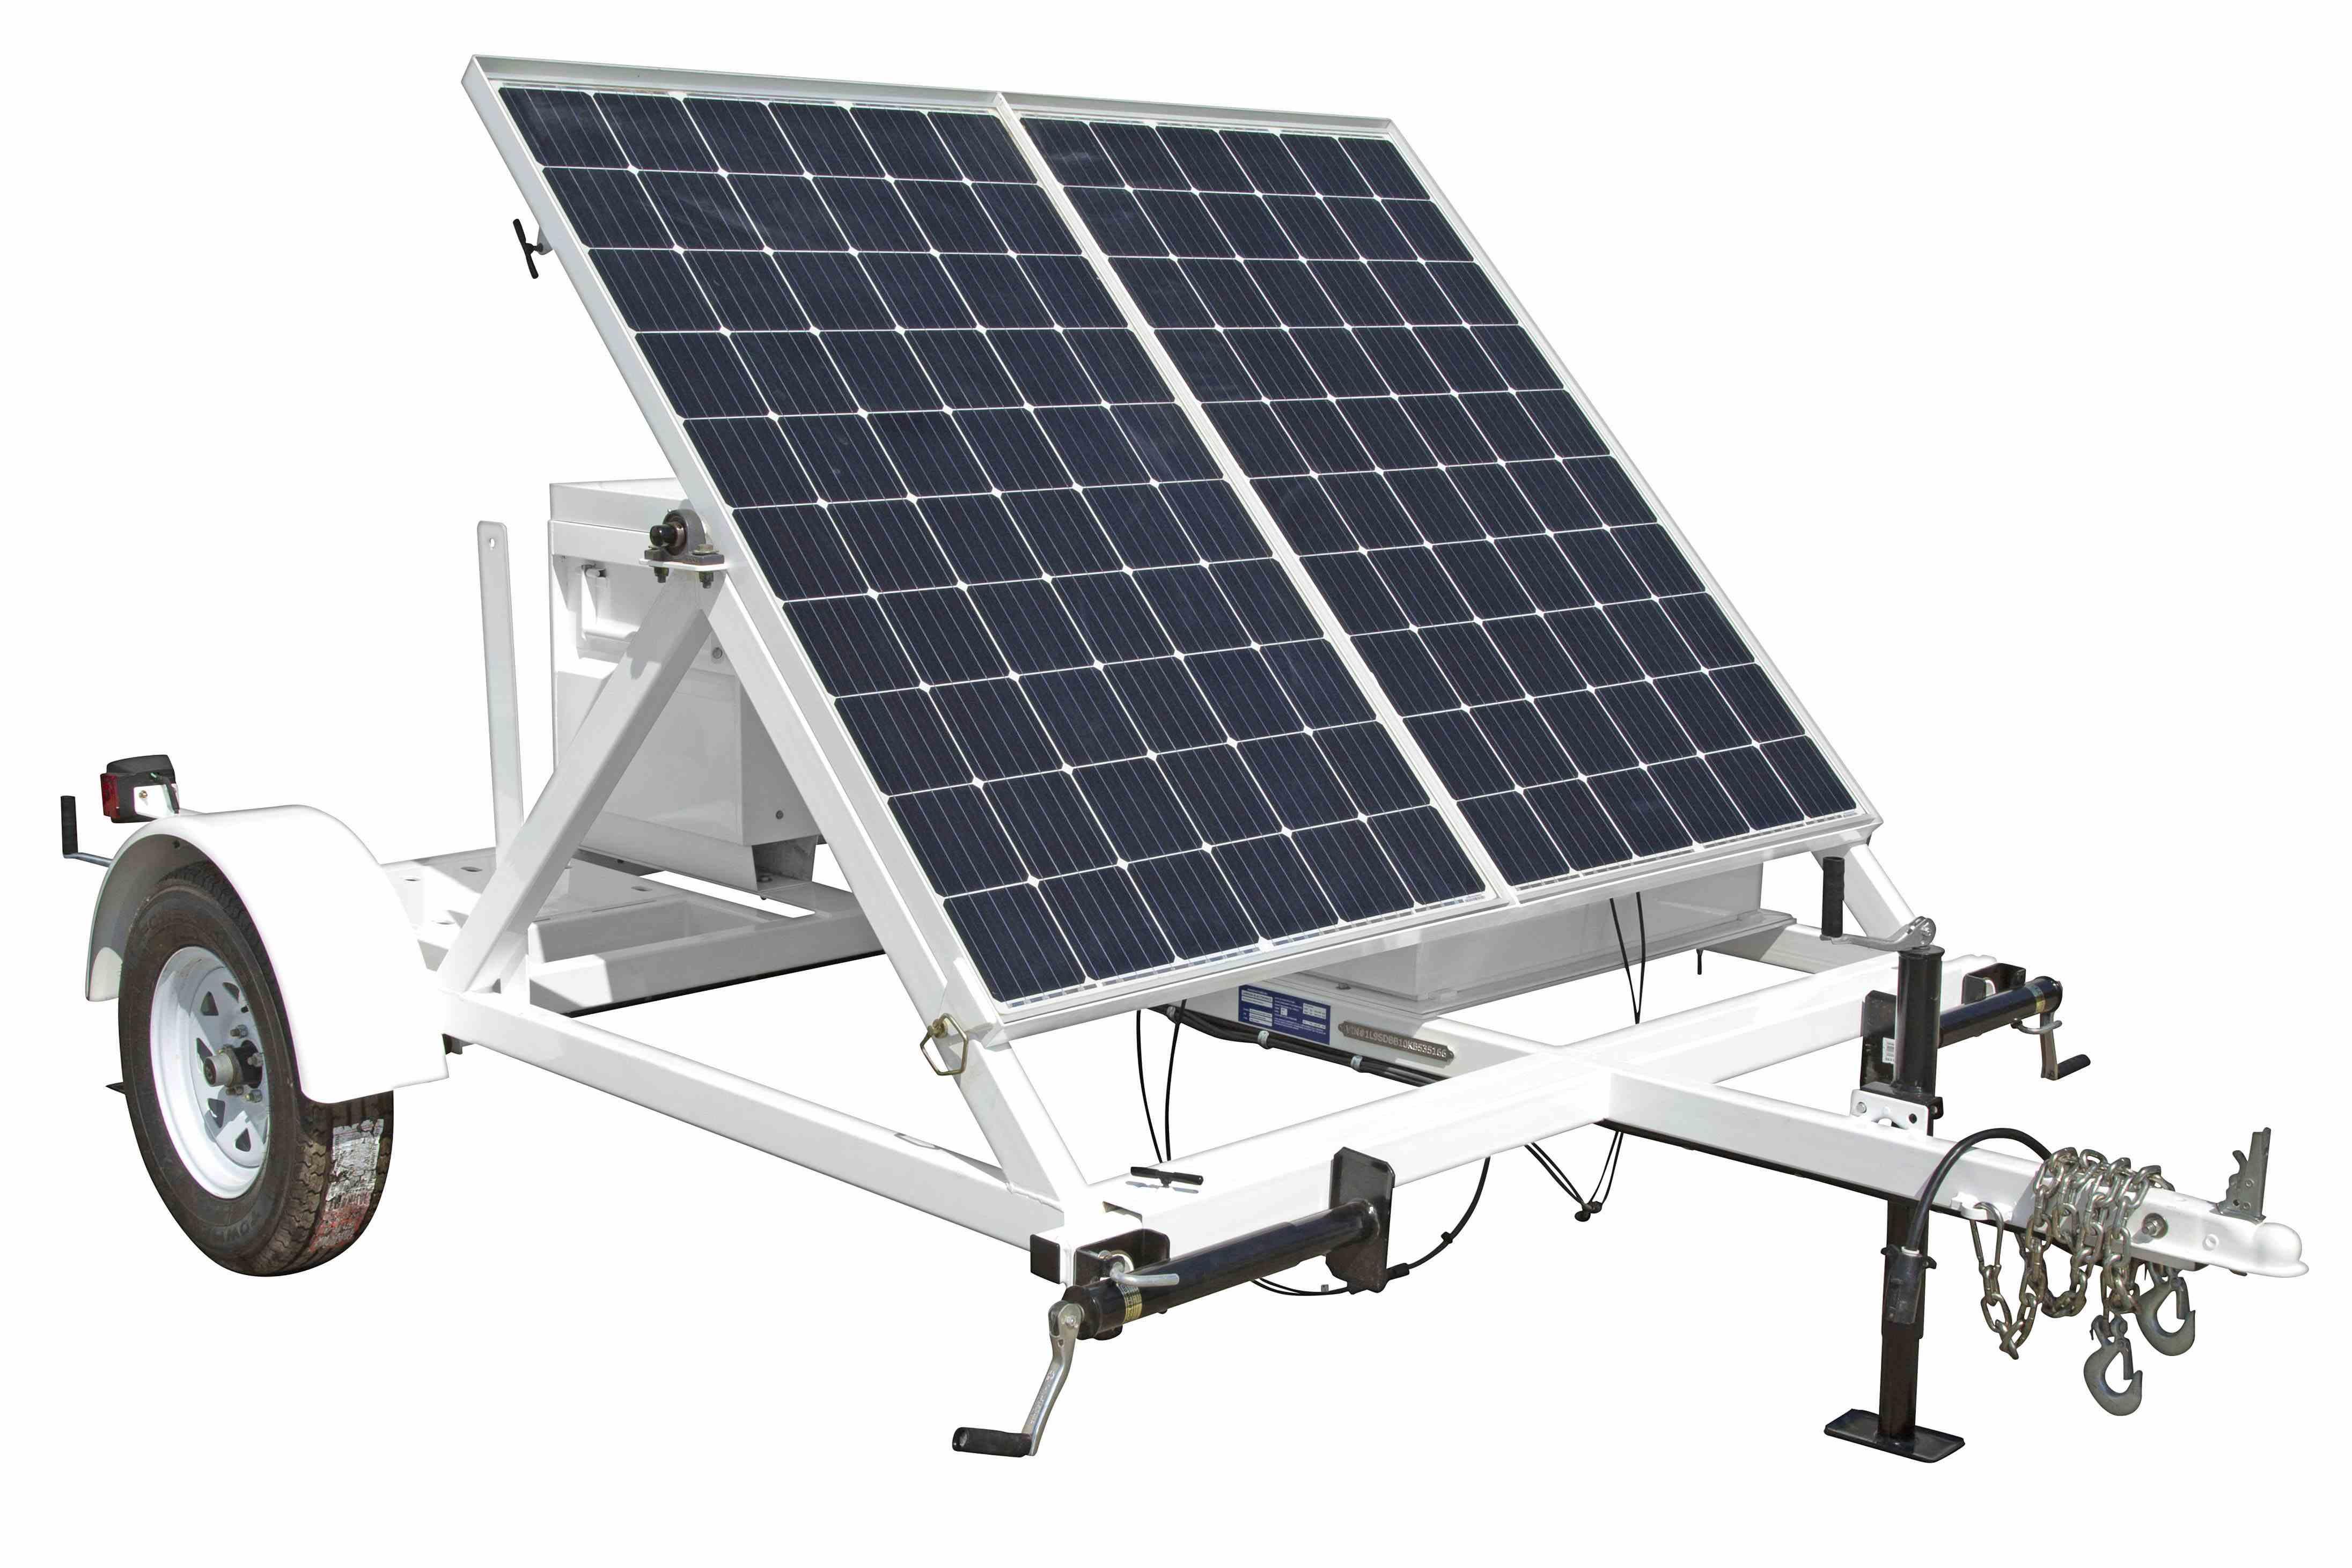 Larson Electronics 0 53kw Portable Solar Power Generator 10 39 Trailer 24v 500ah Battery Bank 1 Job Box